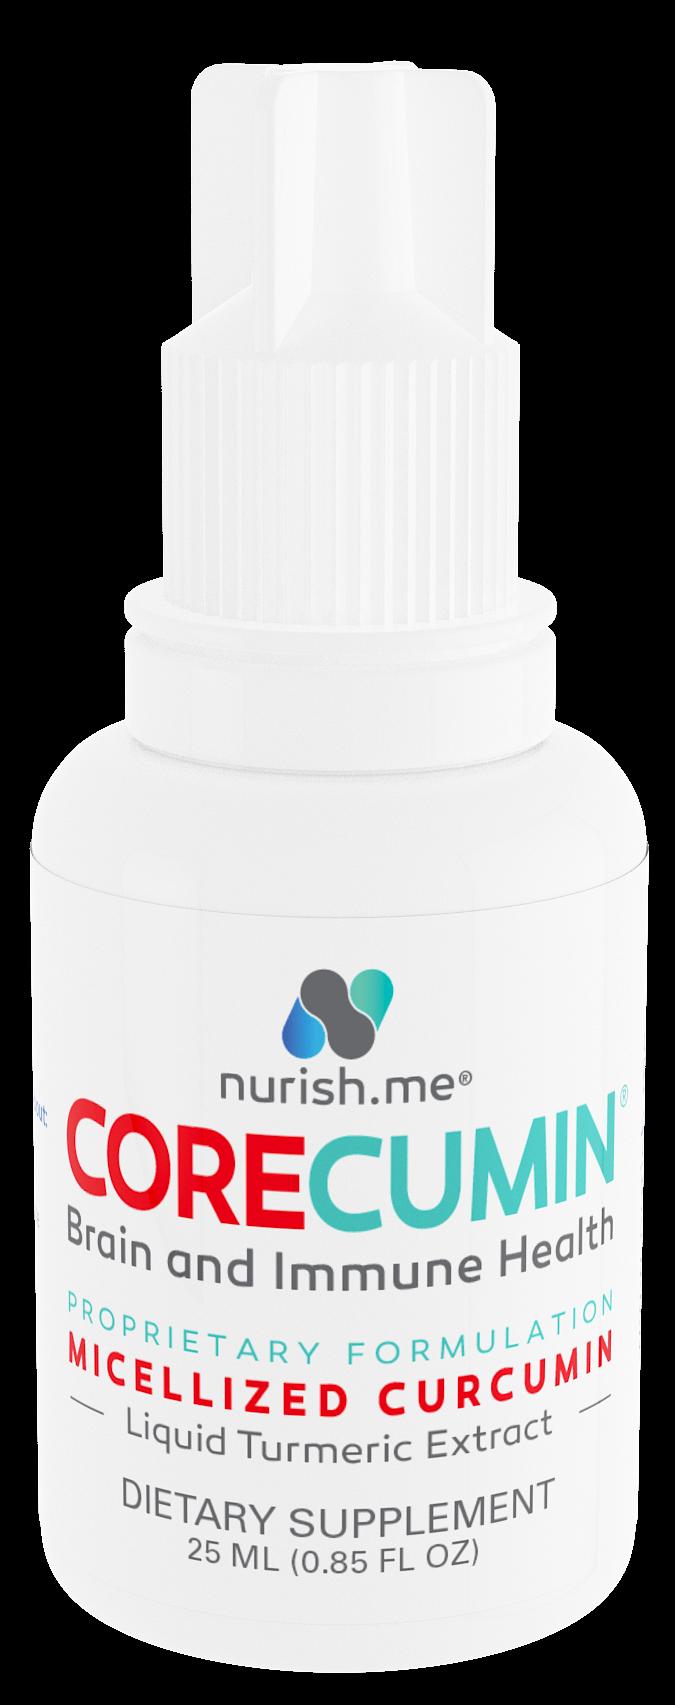 CoreCumin®